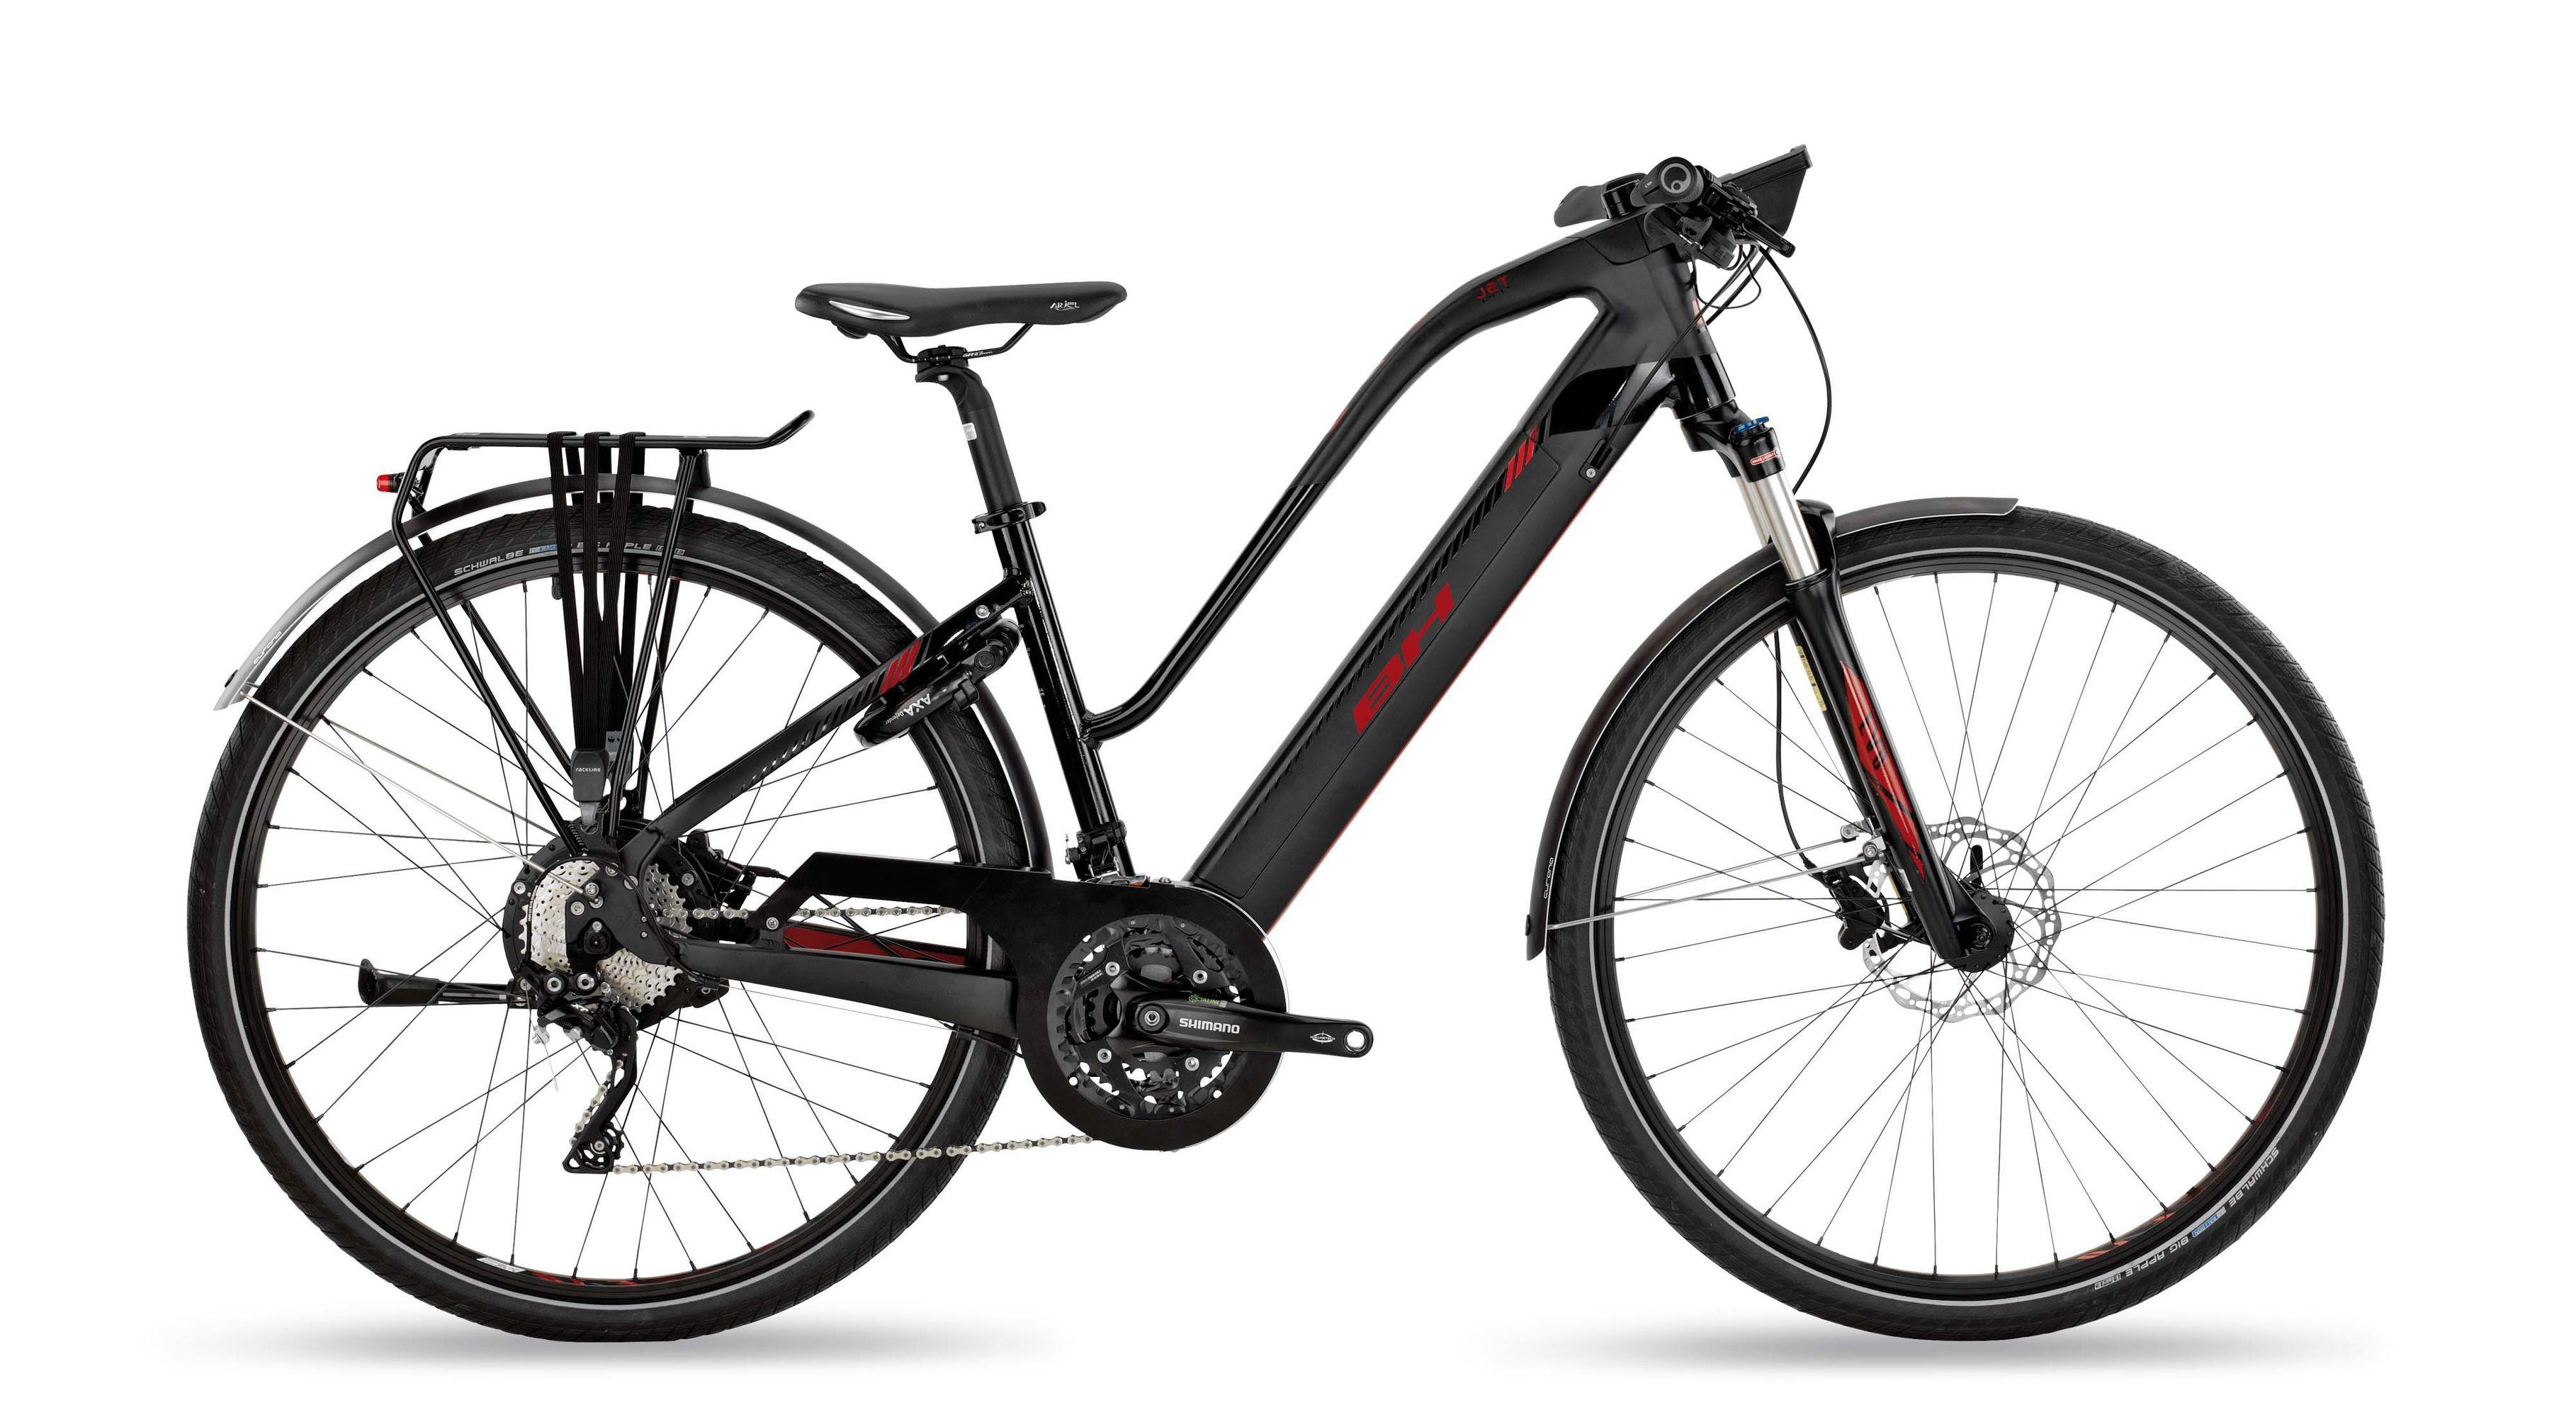 greenbike pesaro-BHbikes-bici elettriche-Evo Jet Pro